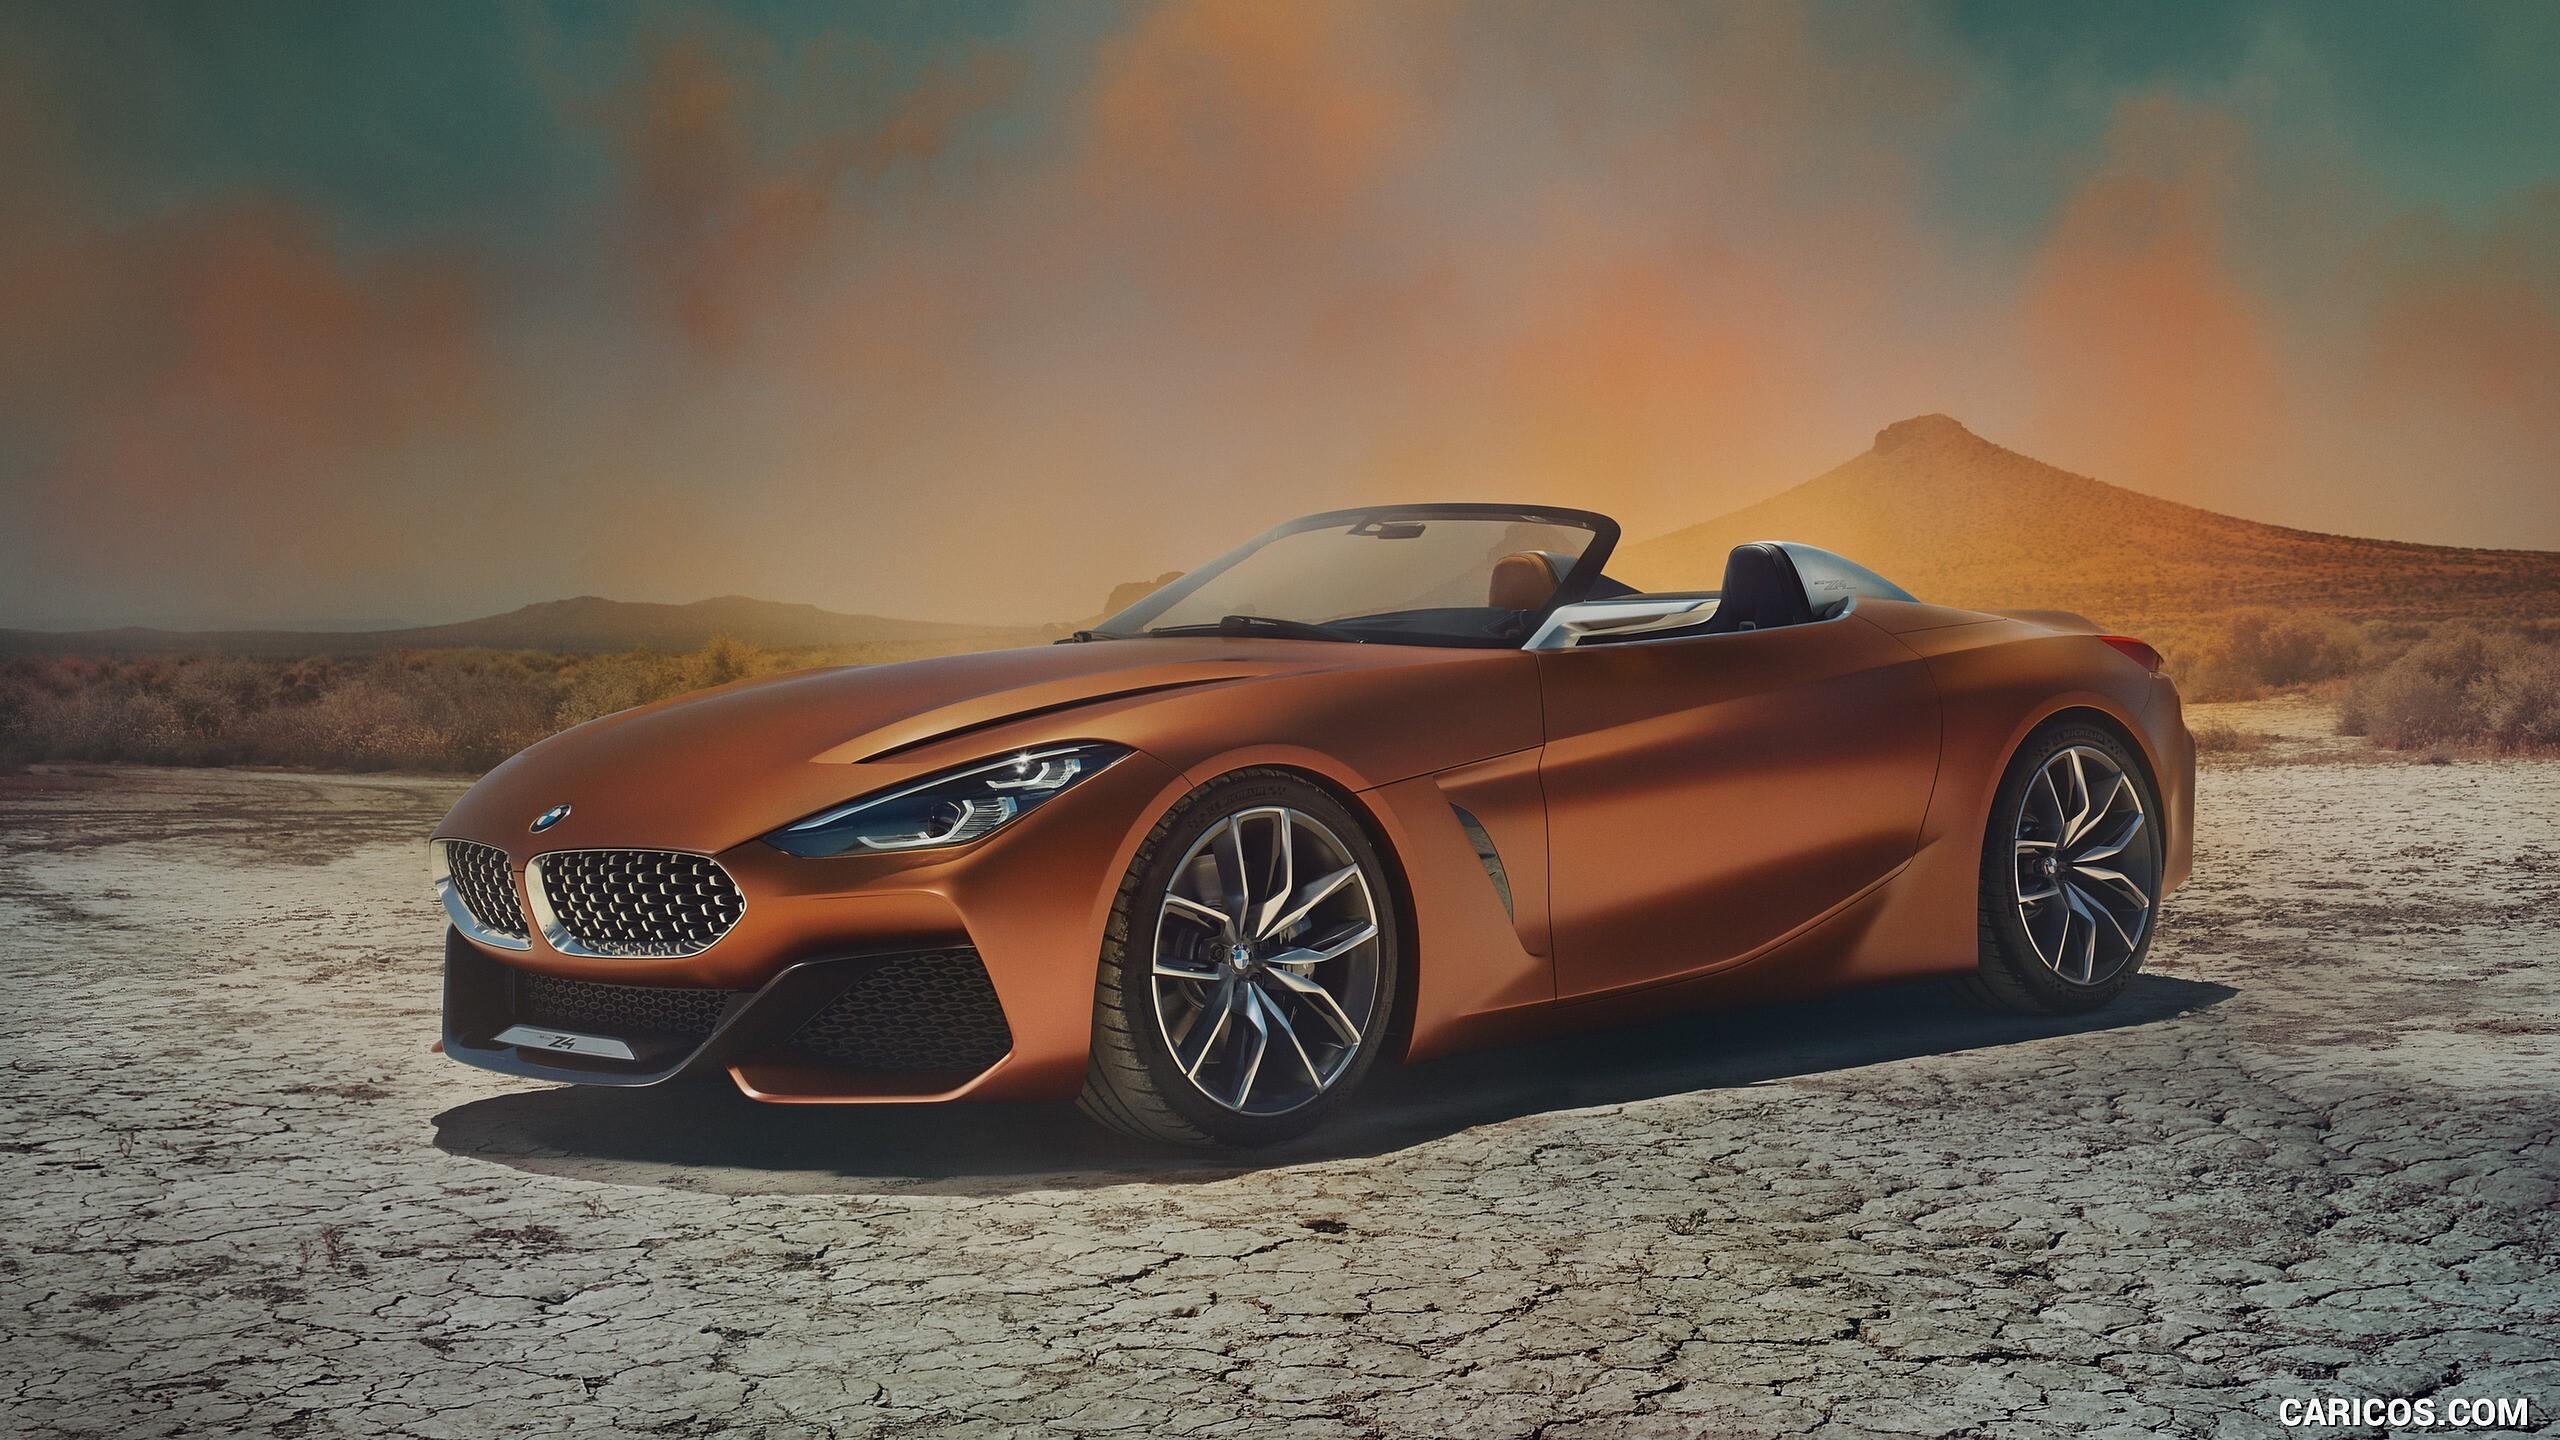 Bmw z4 2018 car wallpaper hd wallpapers - Bmw cars wallpapers hd free download ...